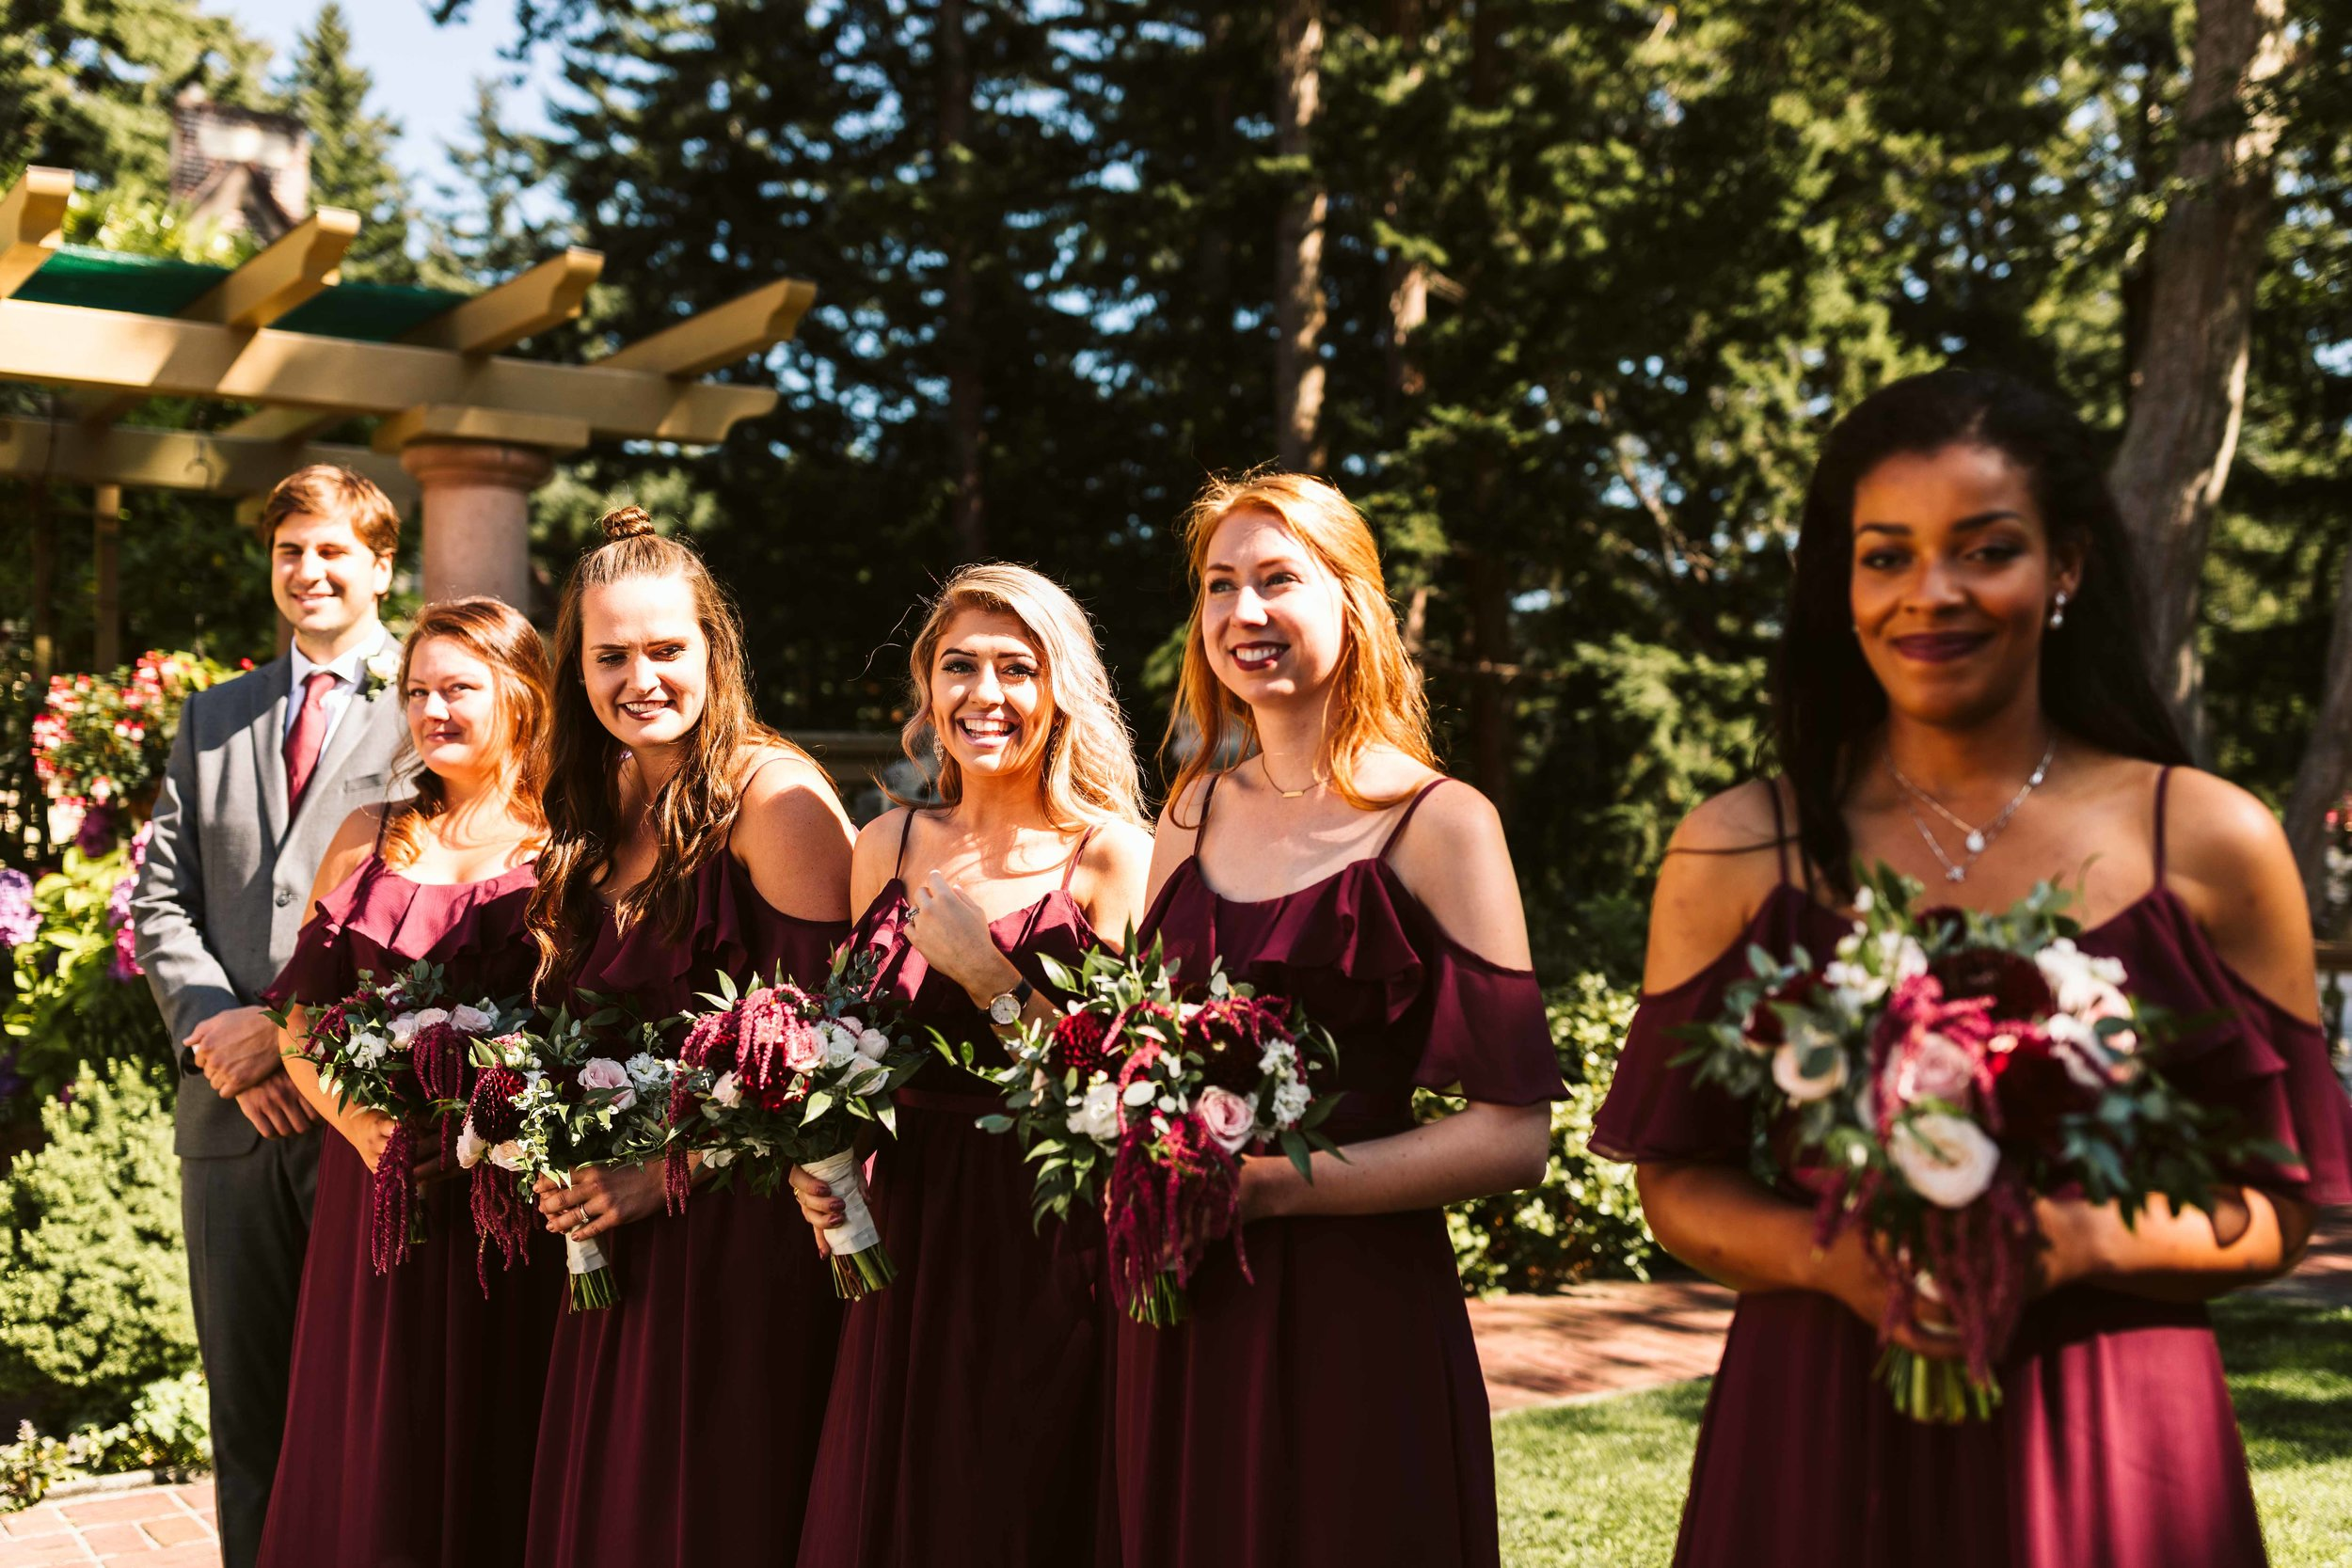 lairmont-manor-wedding-55.jpg